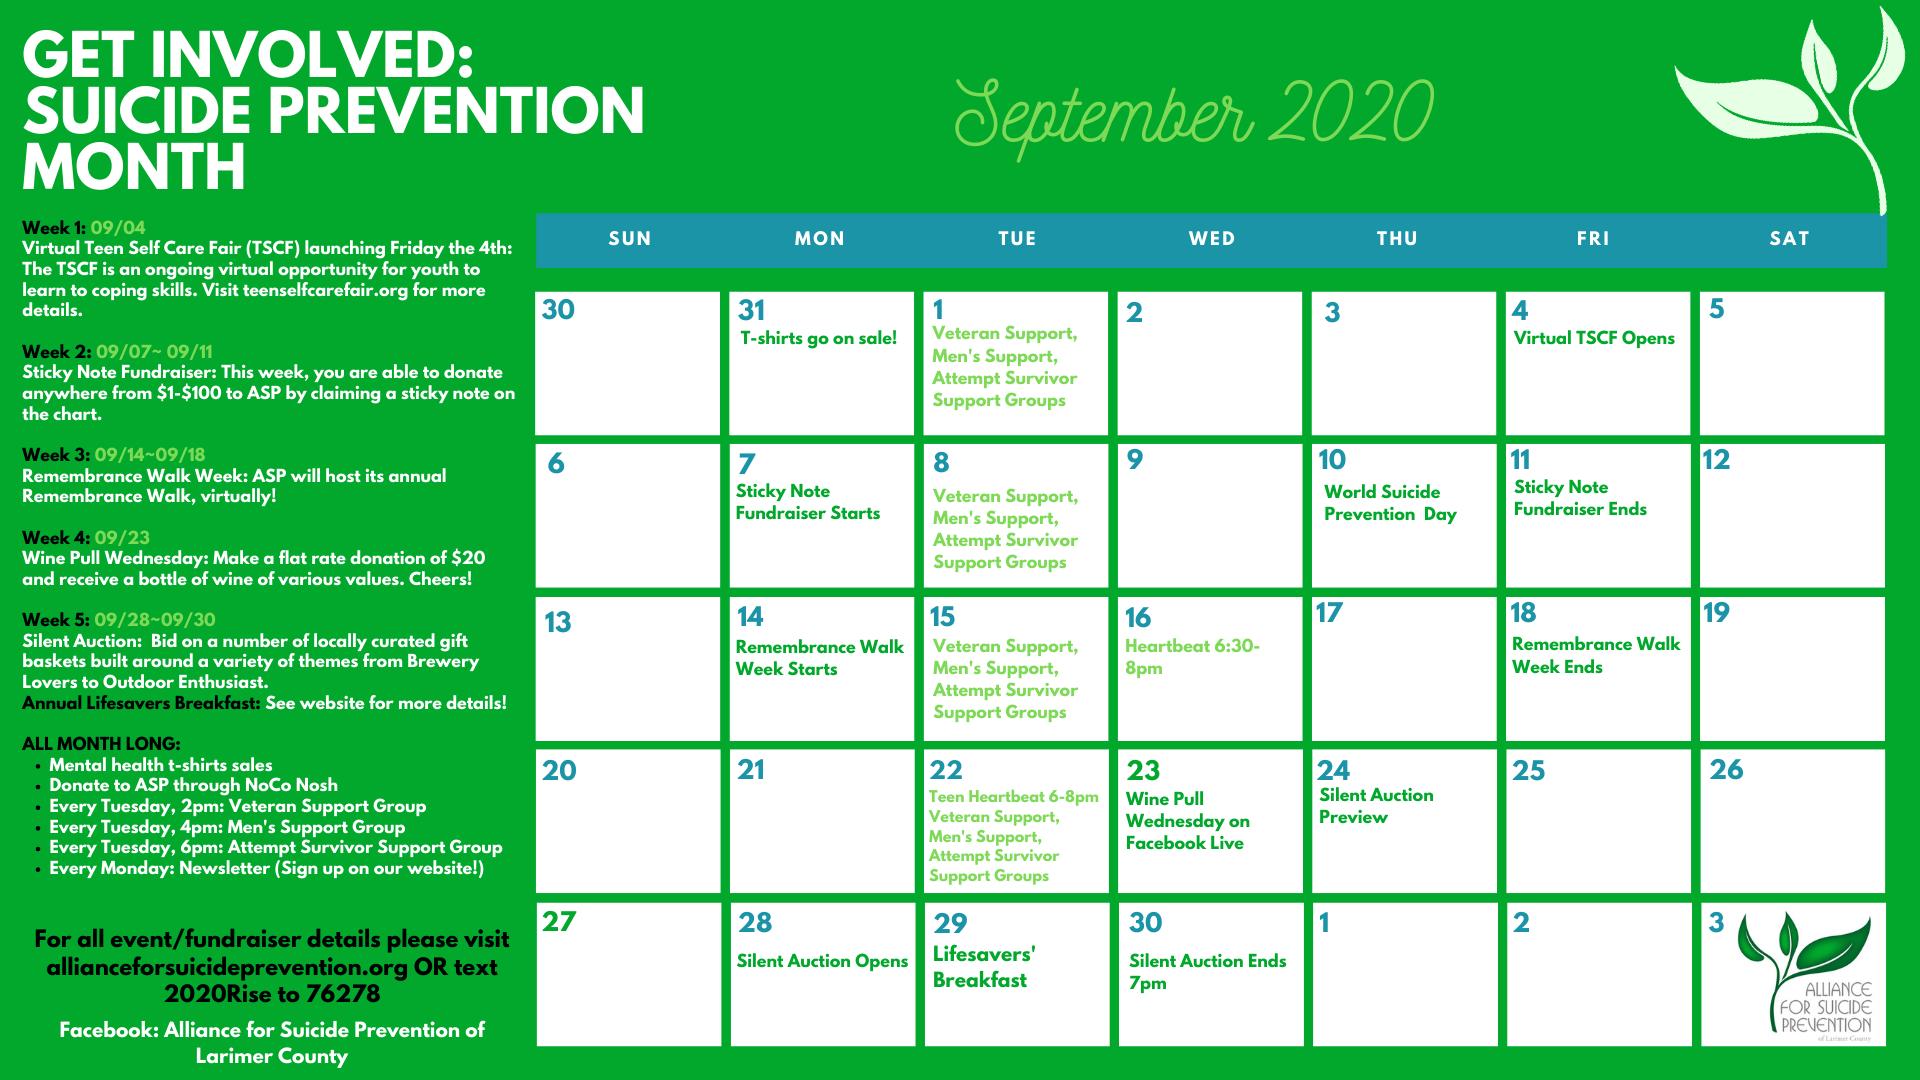 Suicide Prevention Month Calendar